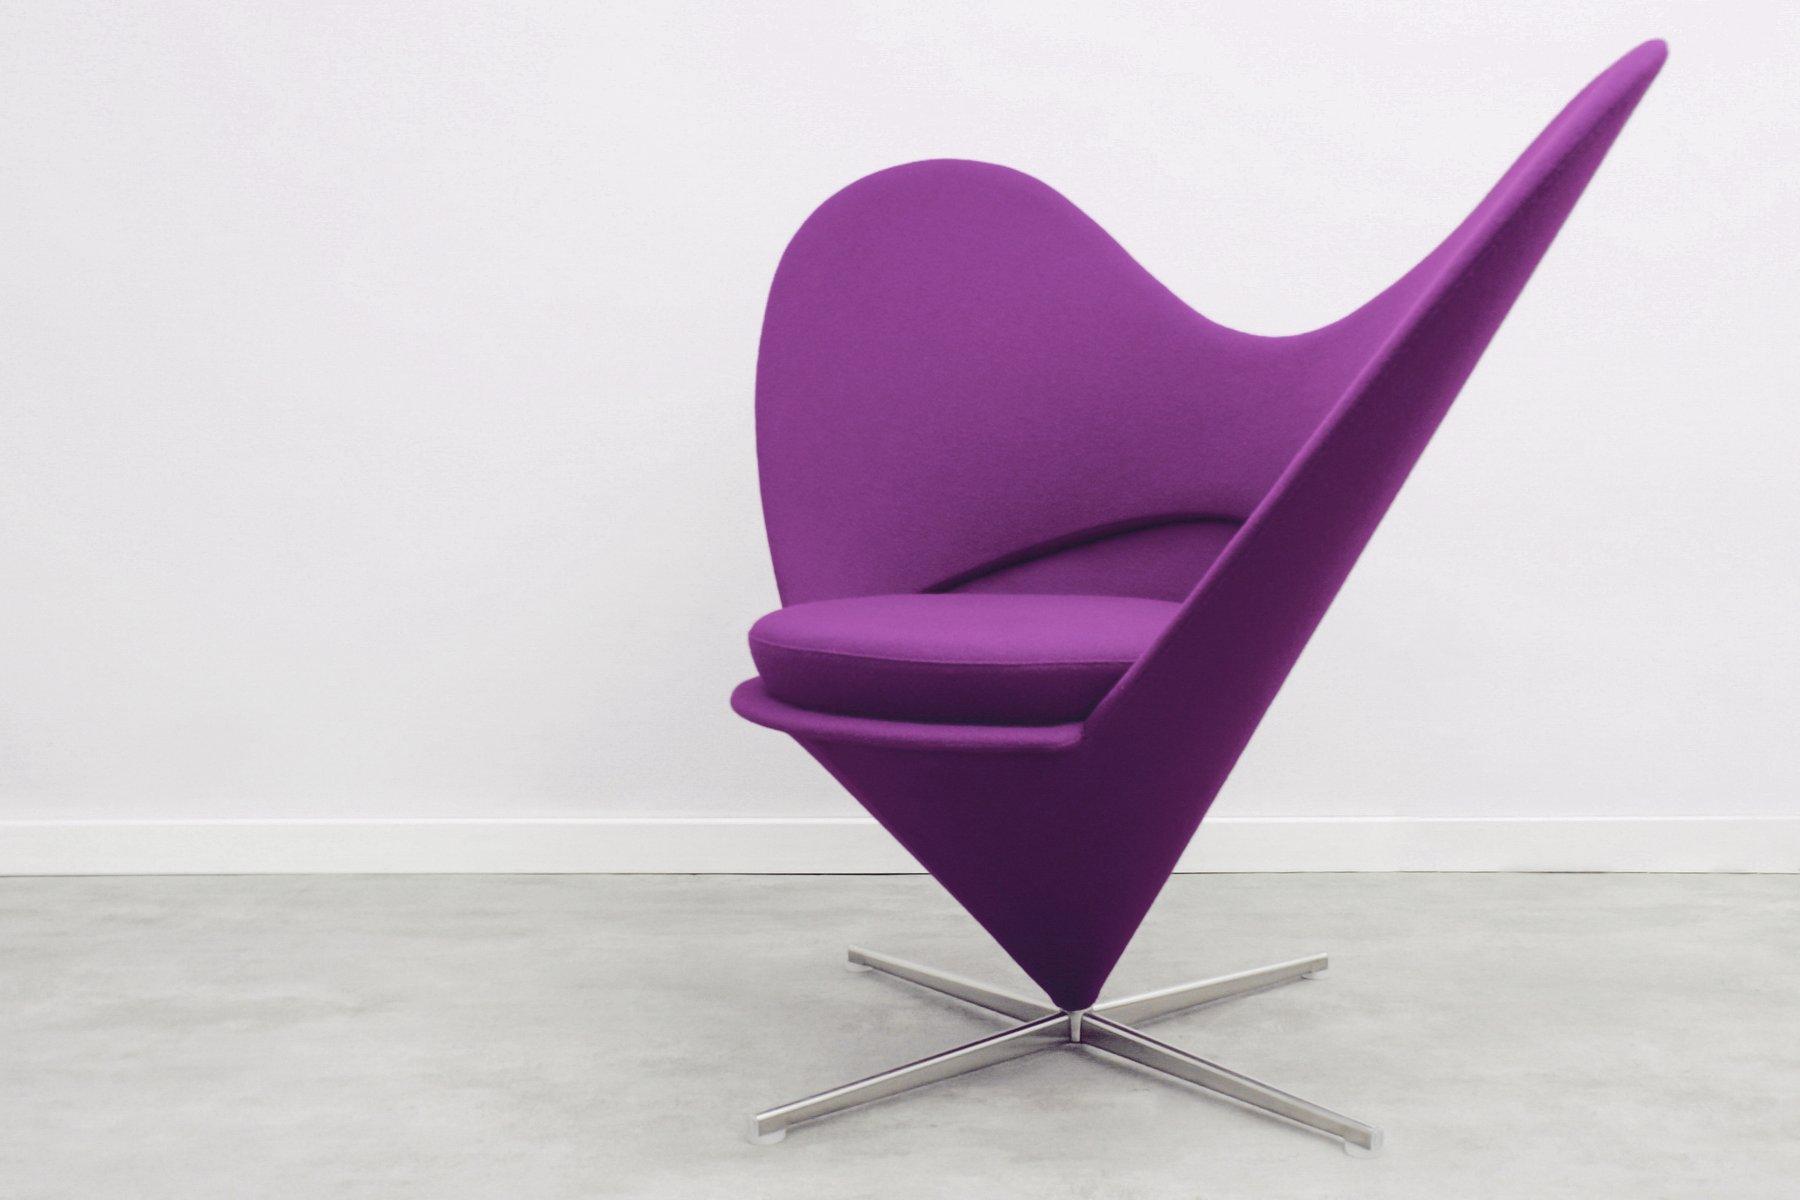 heart cone sessel von verner panton f r vitra 1980er bei pamono kaufen. Black Bedroom Furniture Sets. Home Design Ideas